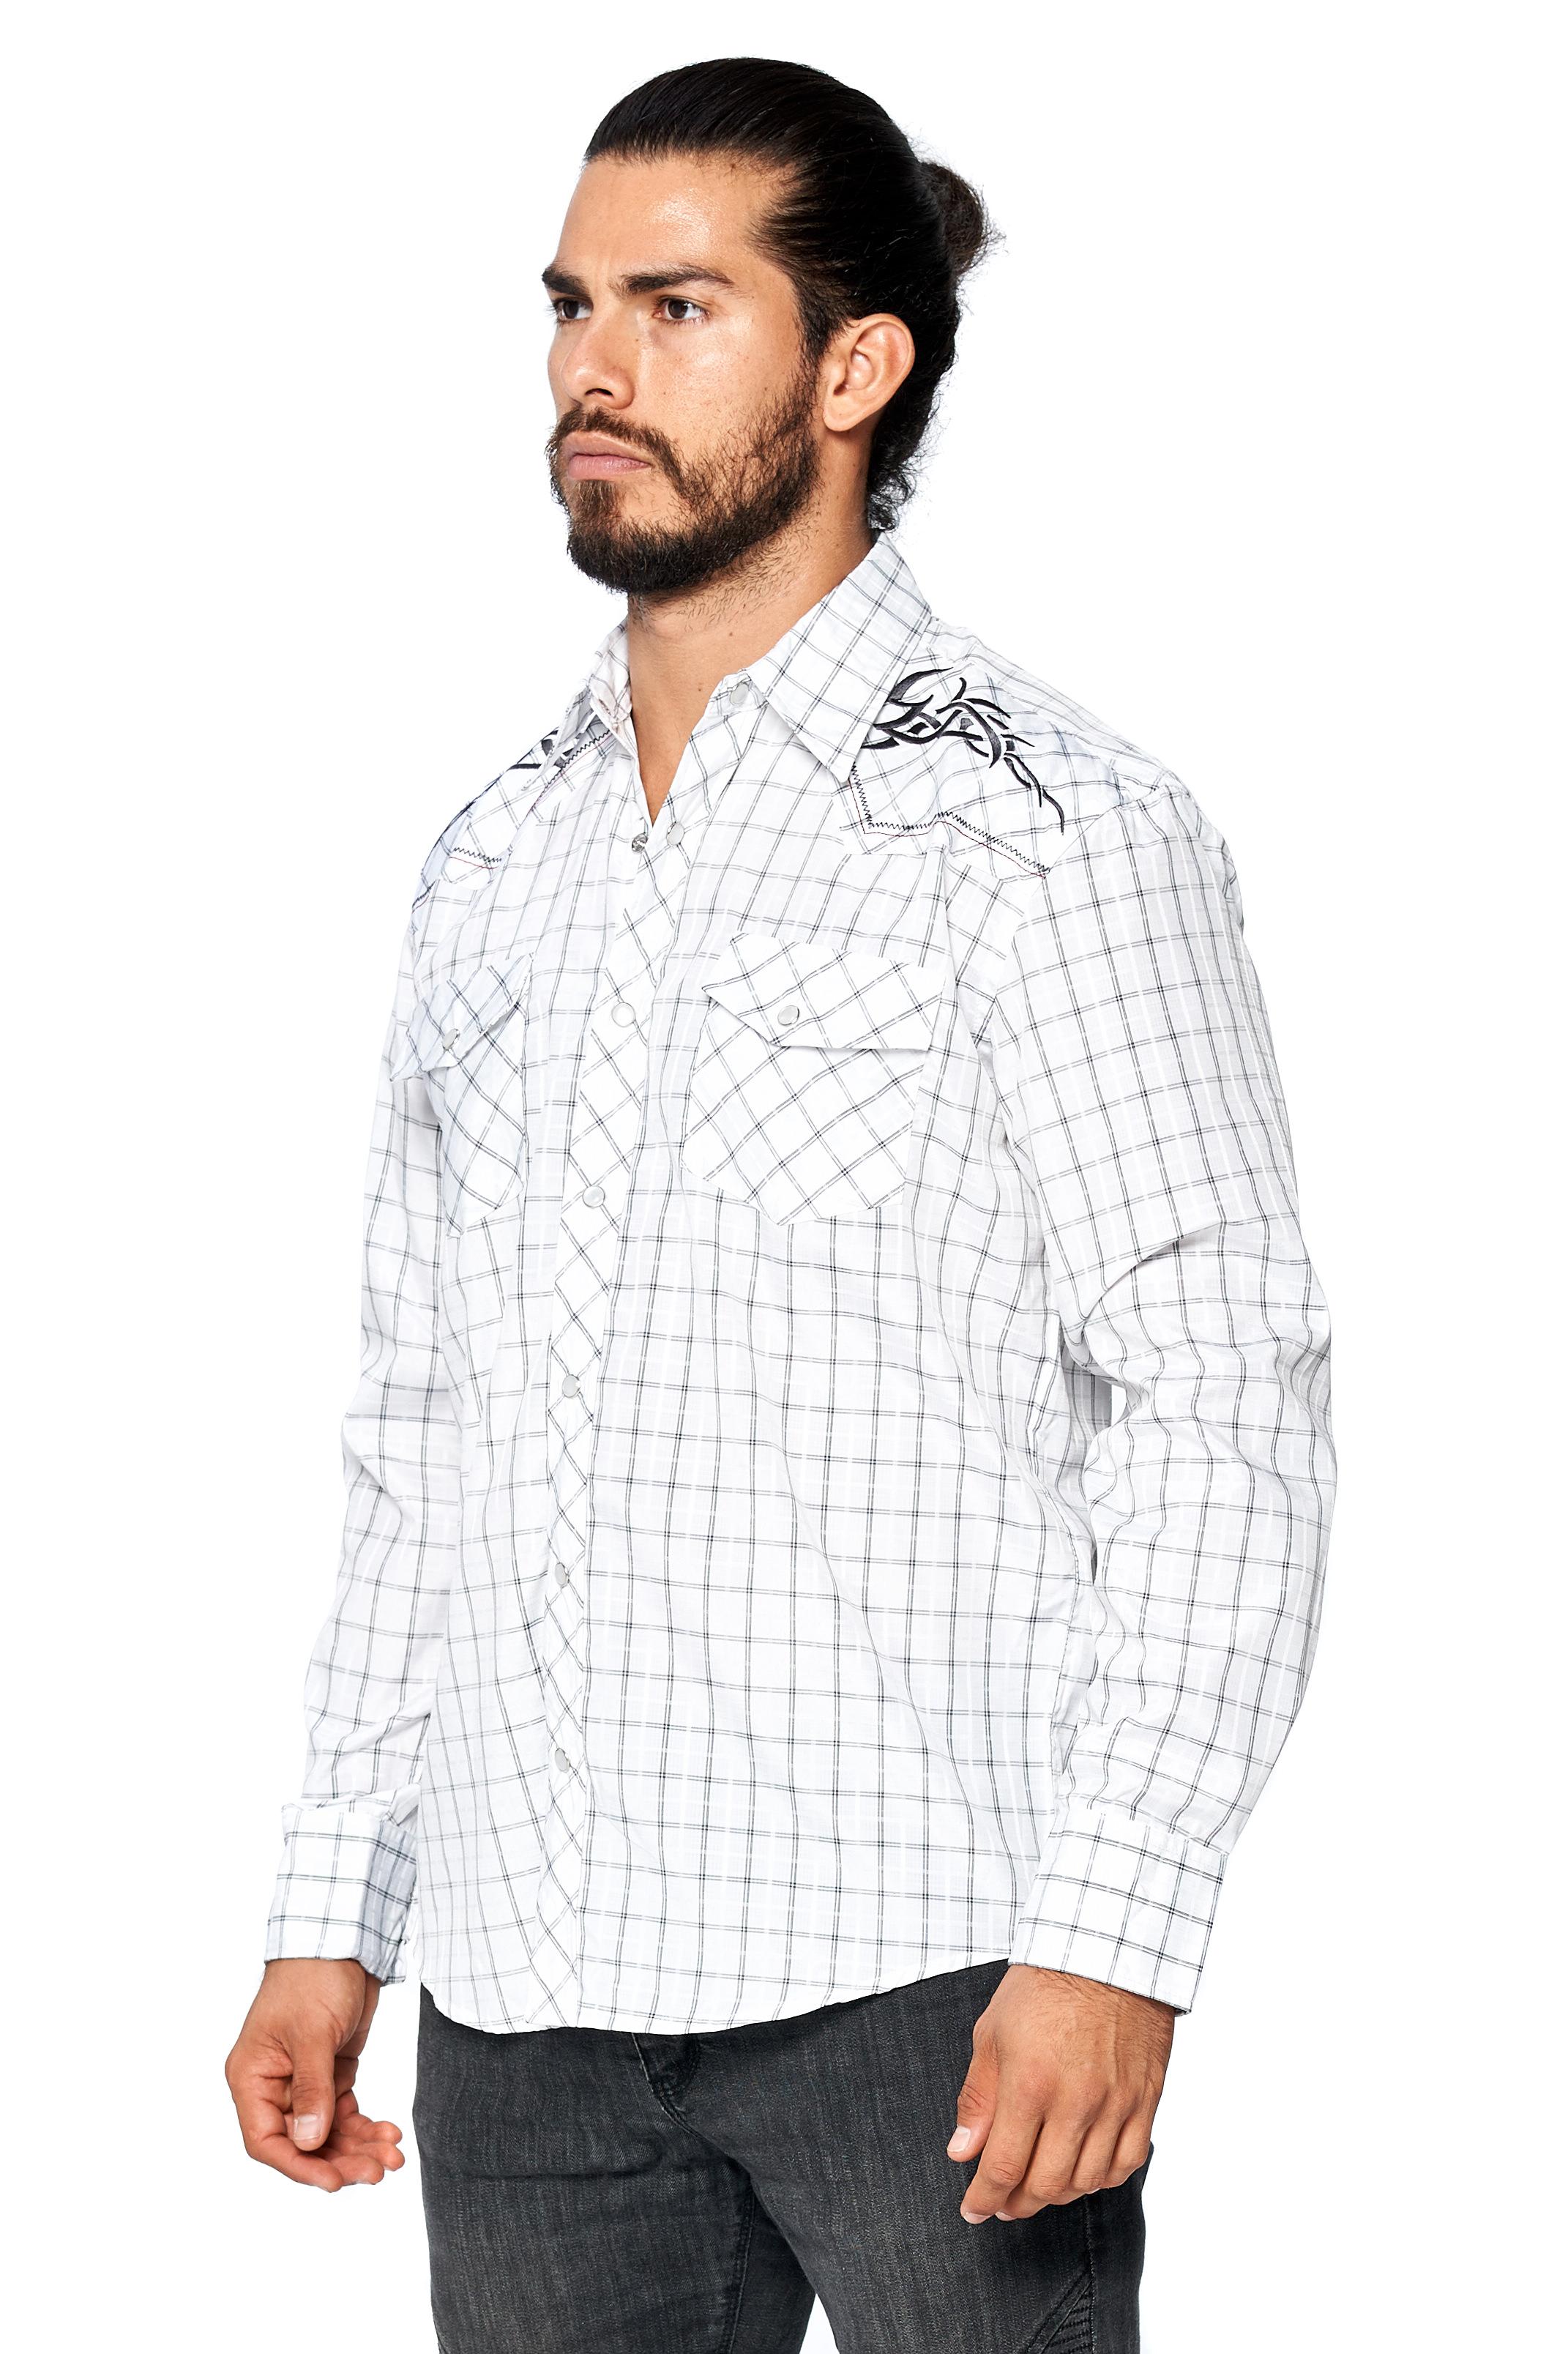 LW-Men-039-s-Pearl-Snap-Tribal-Stylish-Printed-Woven-Western-Vaquero-Rodeo-Shirt thumbnail 67